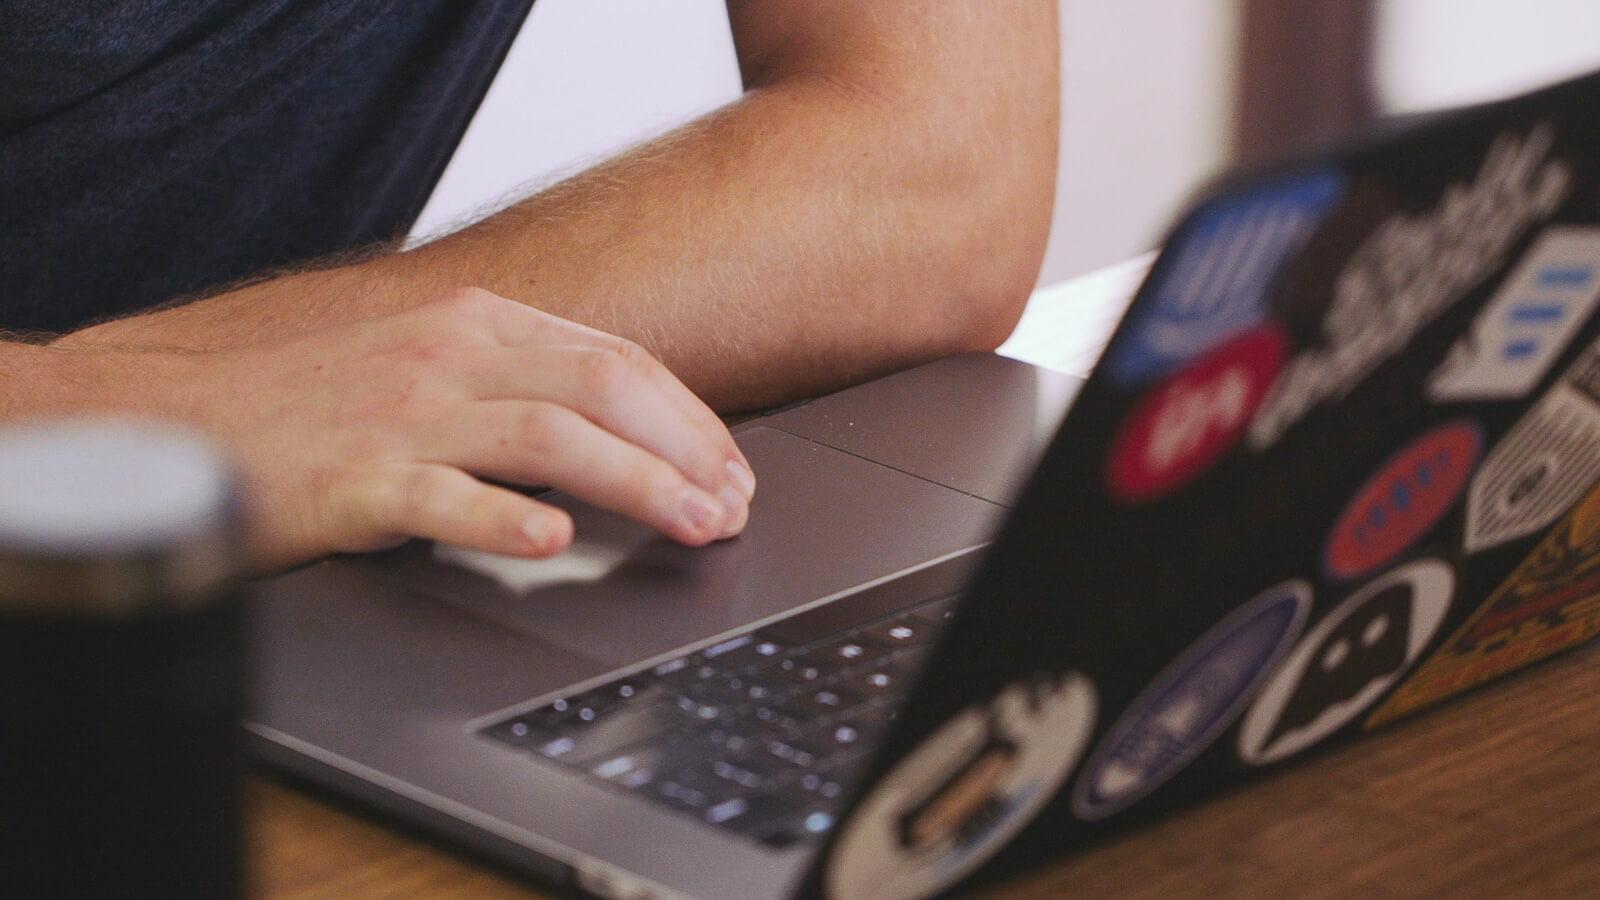 hands typing on macbook pro